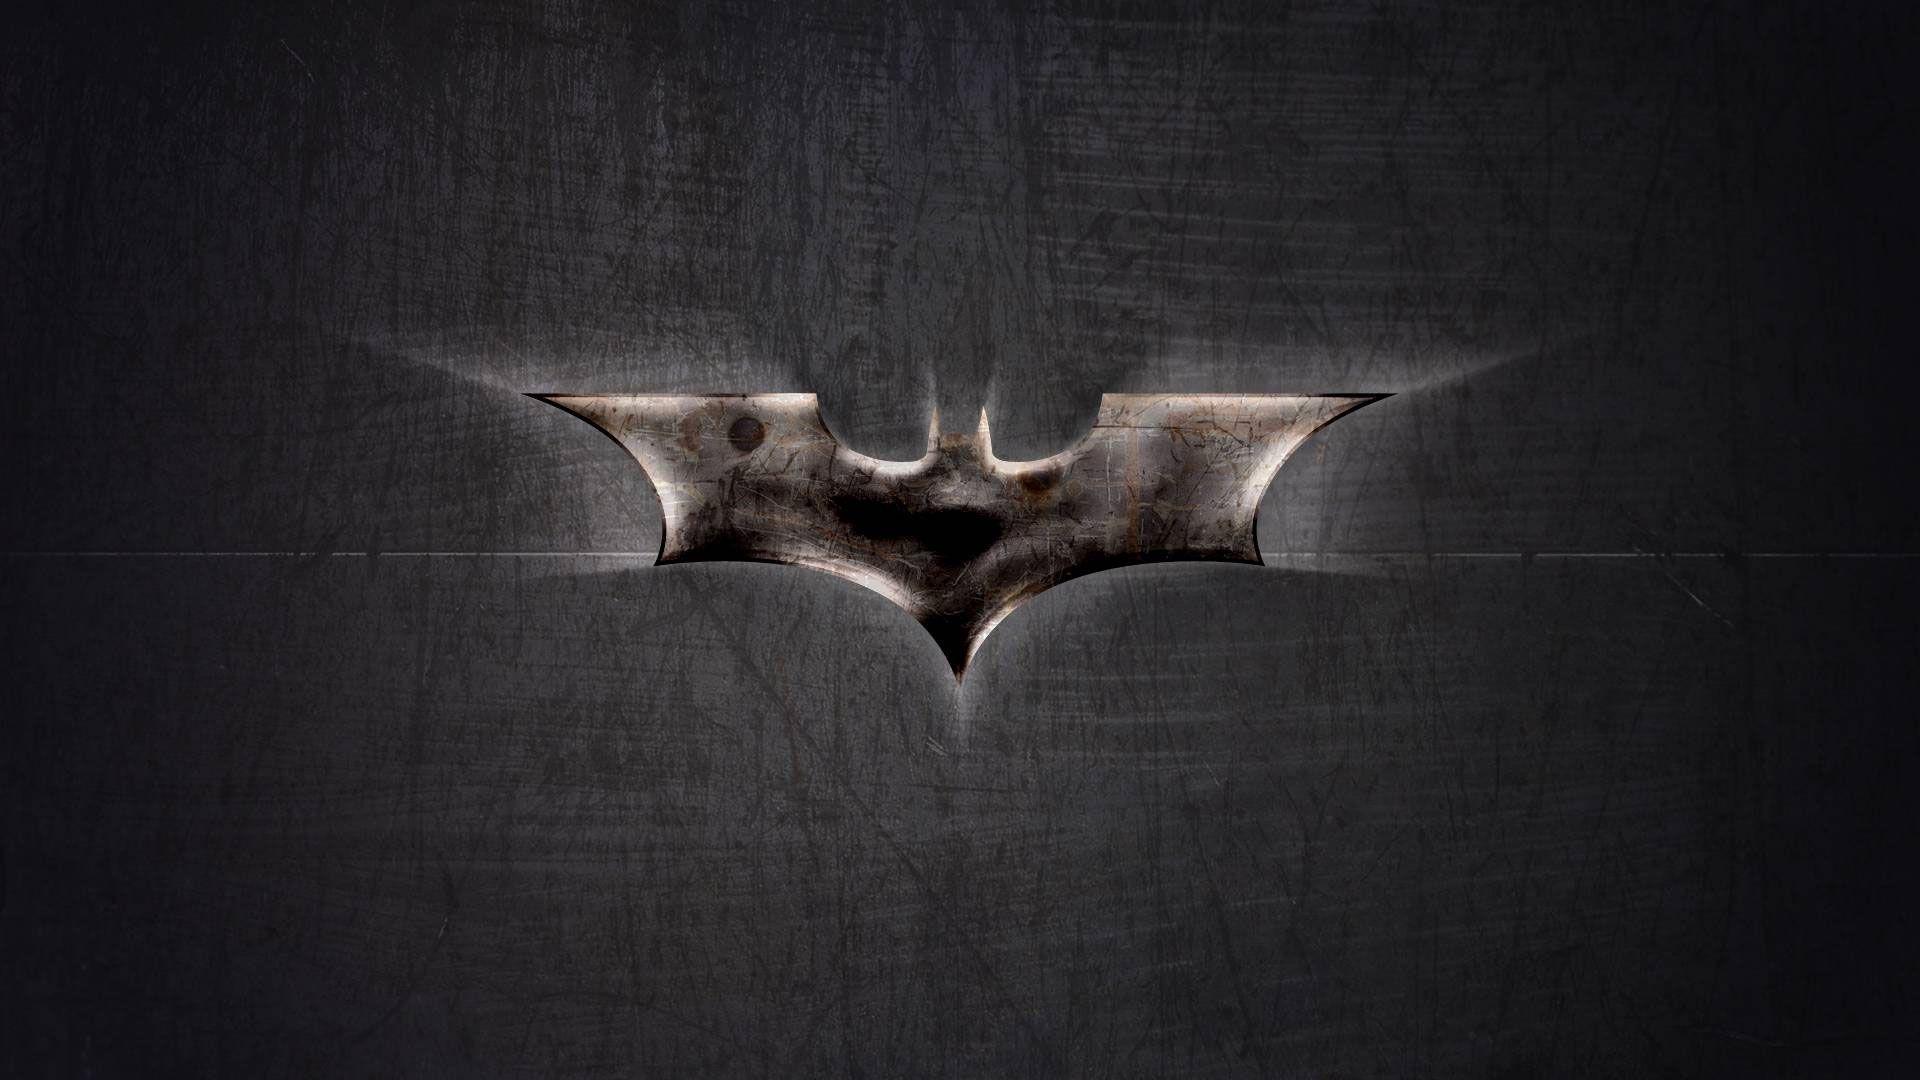 Batman Hd Pics Photos Beautiful Best Attractive Logo Quality Desktop Background Wallpaper